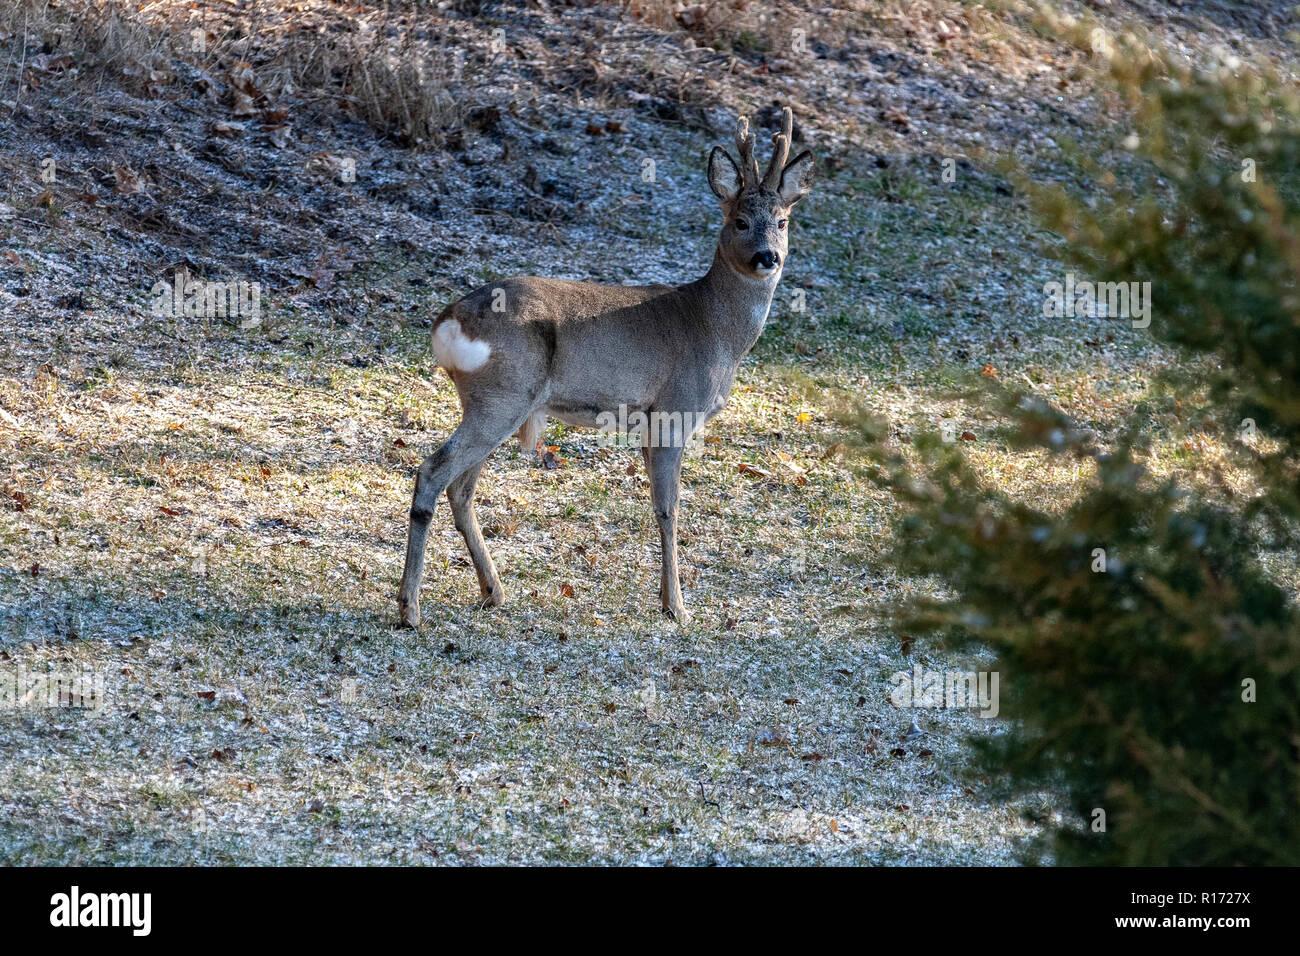 Roe Deer (Capreolus), Europe, Poland Stock Photo